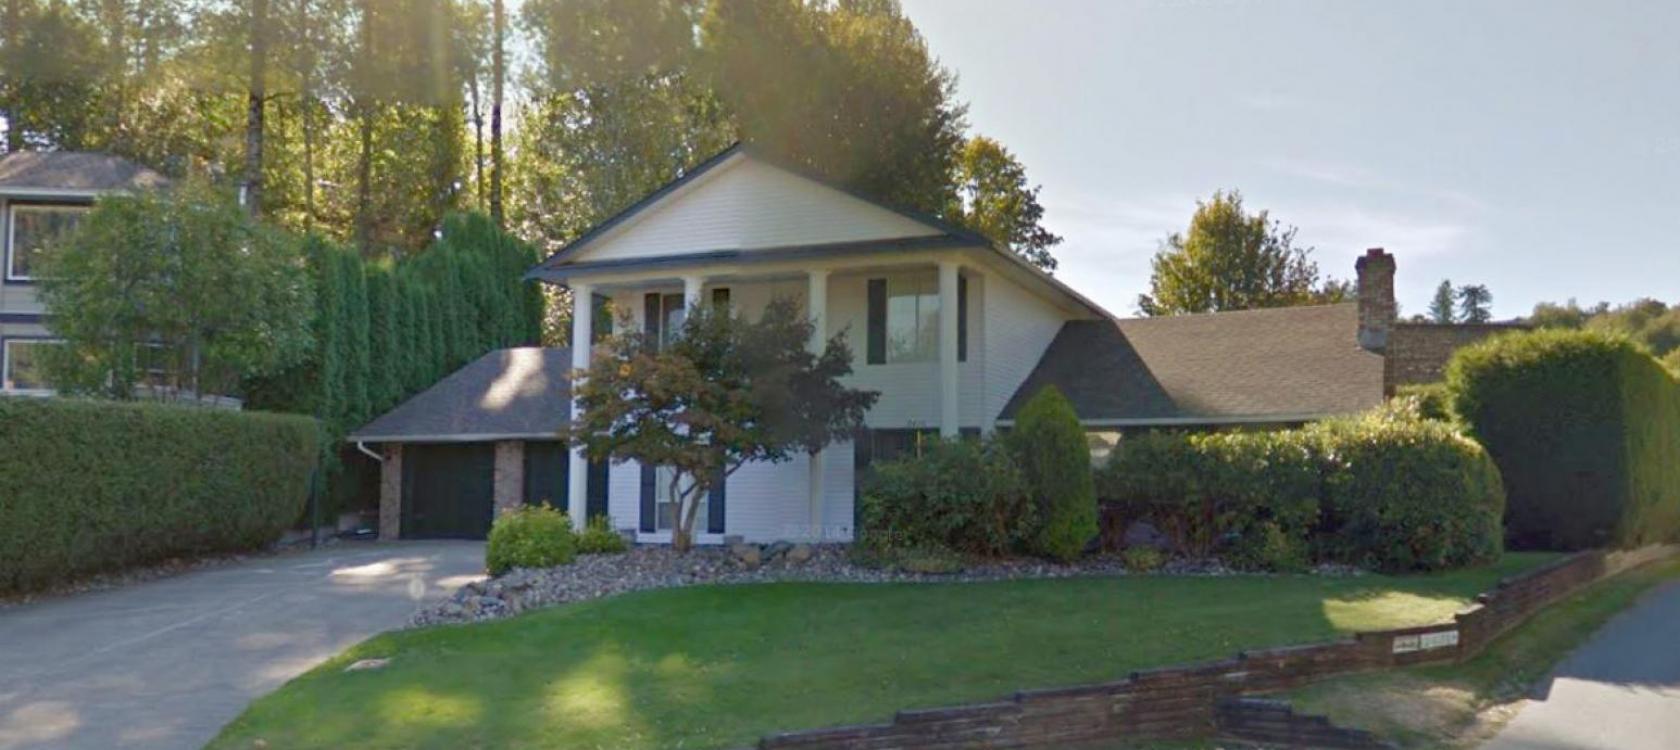 2415 Mountain Drive, Abbotsford East, Abbotsford 2